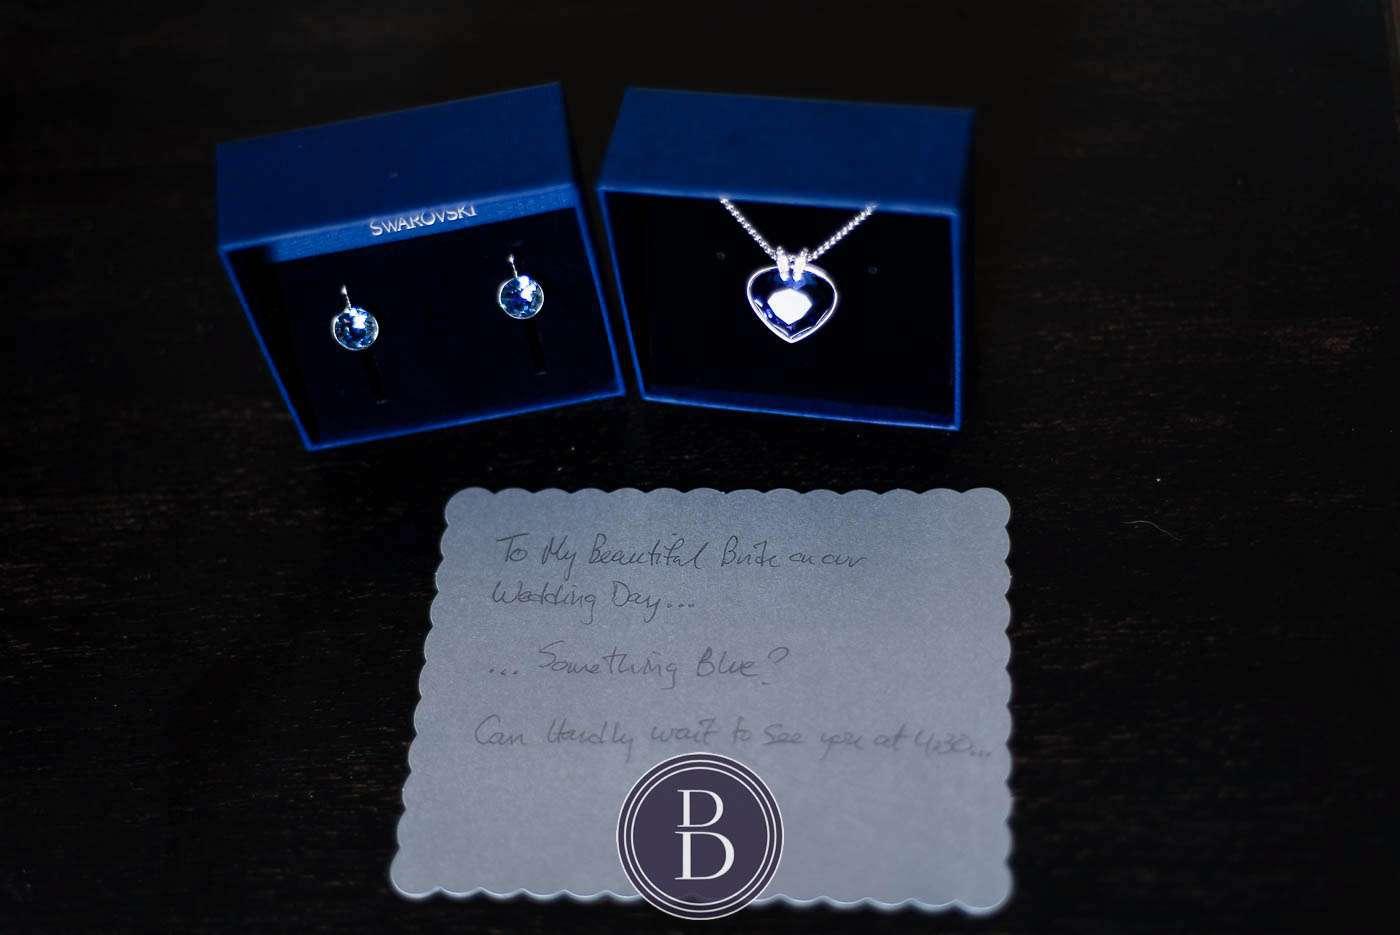 on wedding day blue jewellery gift